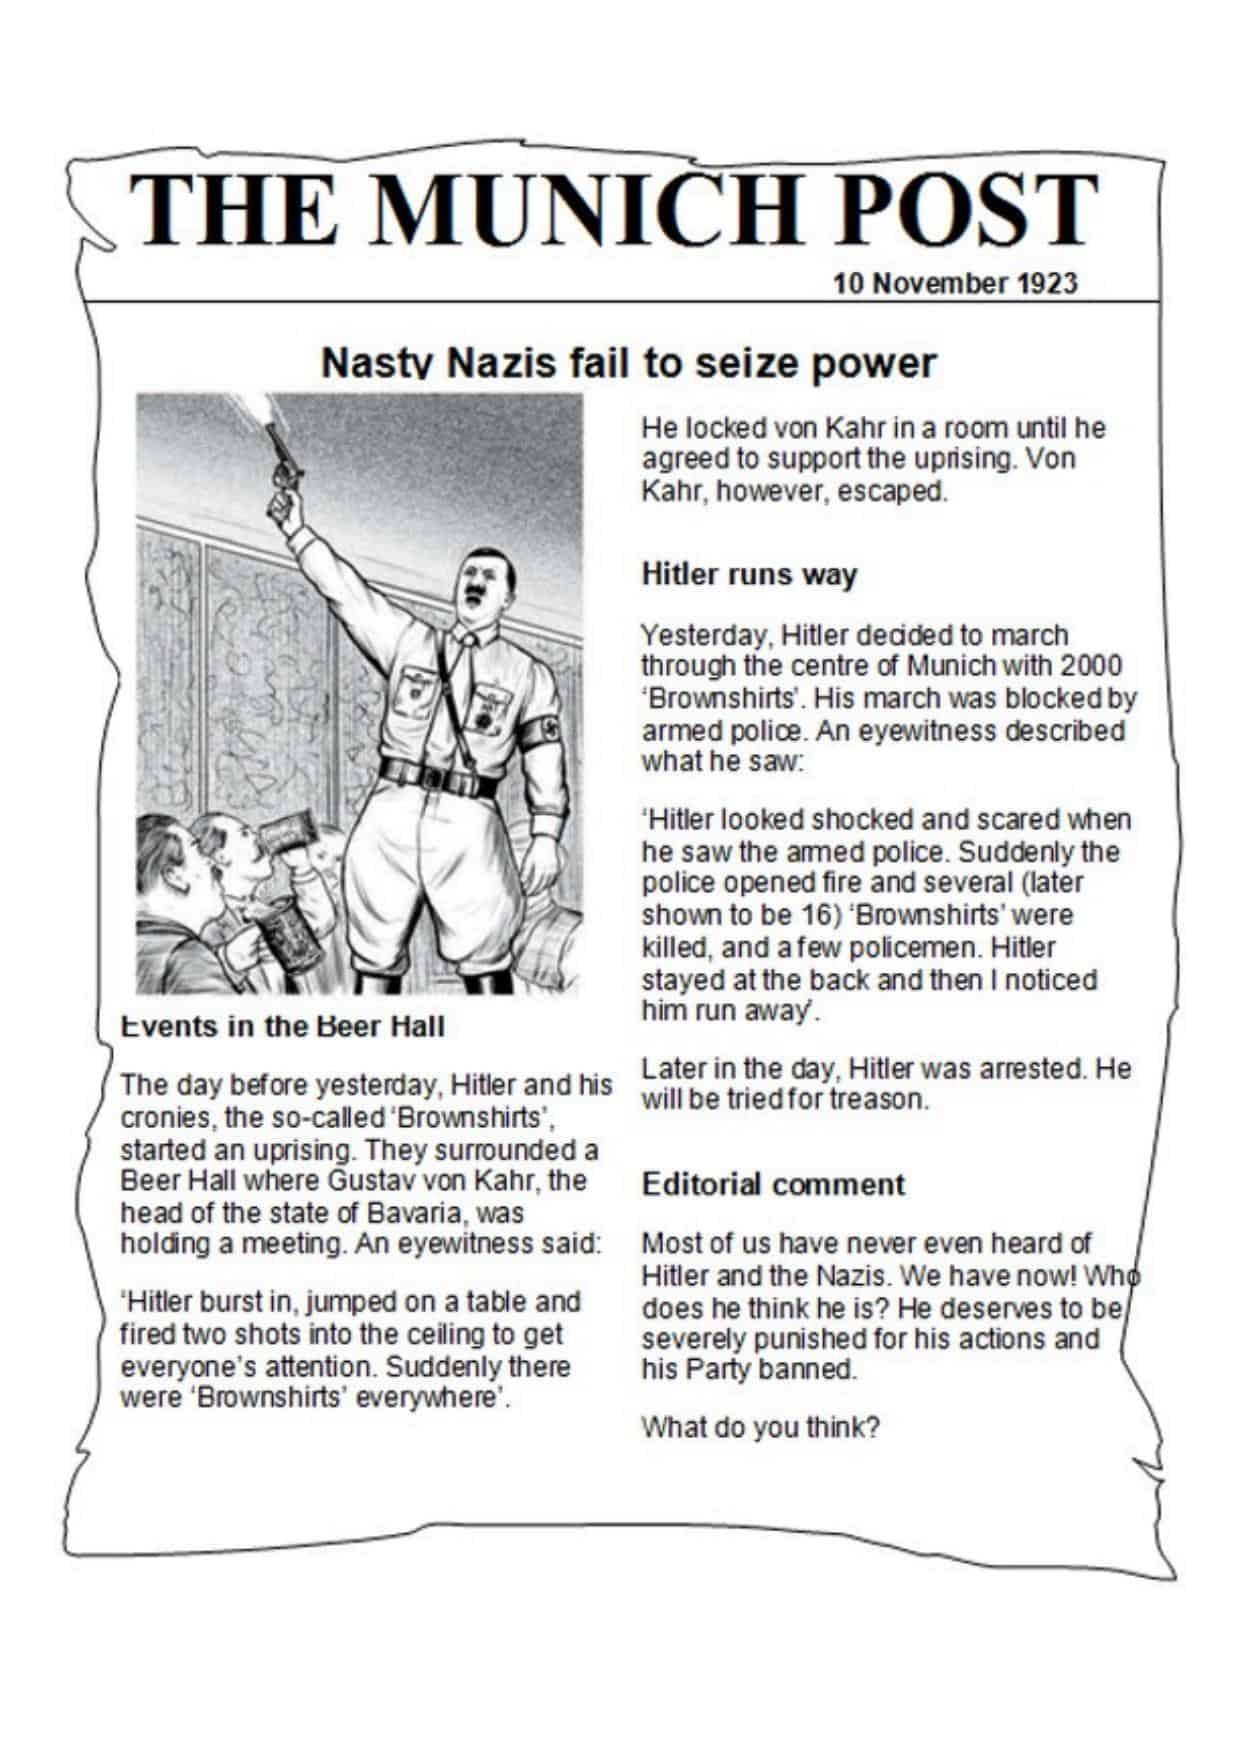 Munich Putsch Newspaper Article Worksheet